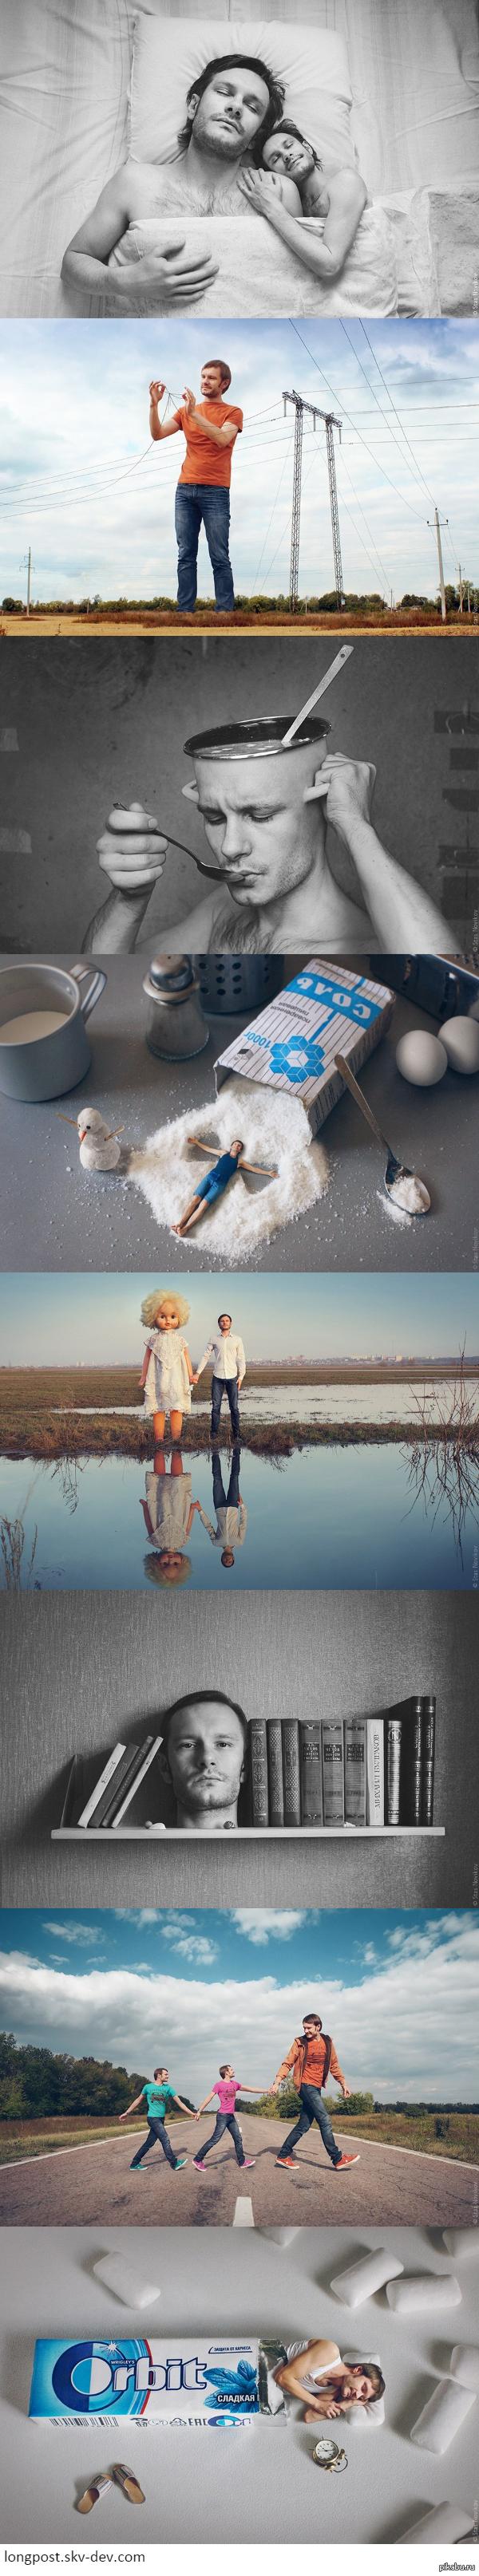 "Фотопроект Станислава Новикова ""365 дней меня"""